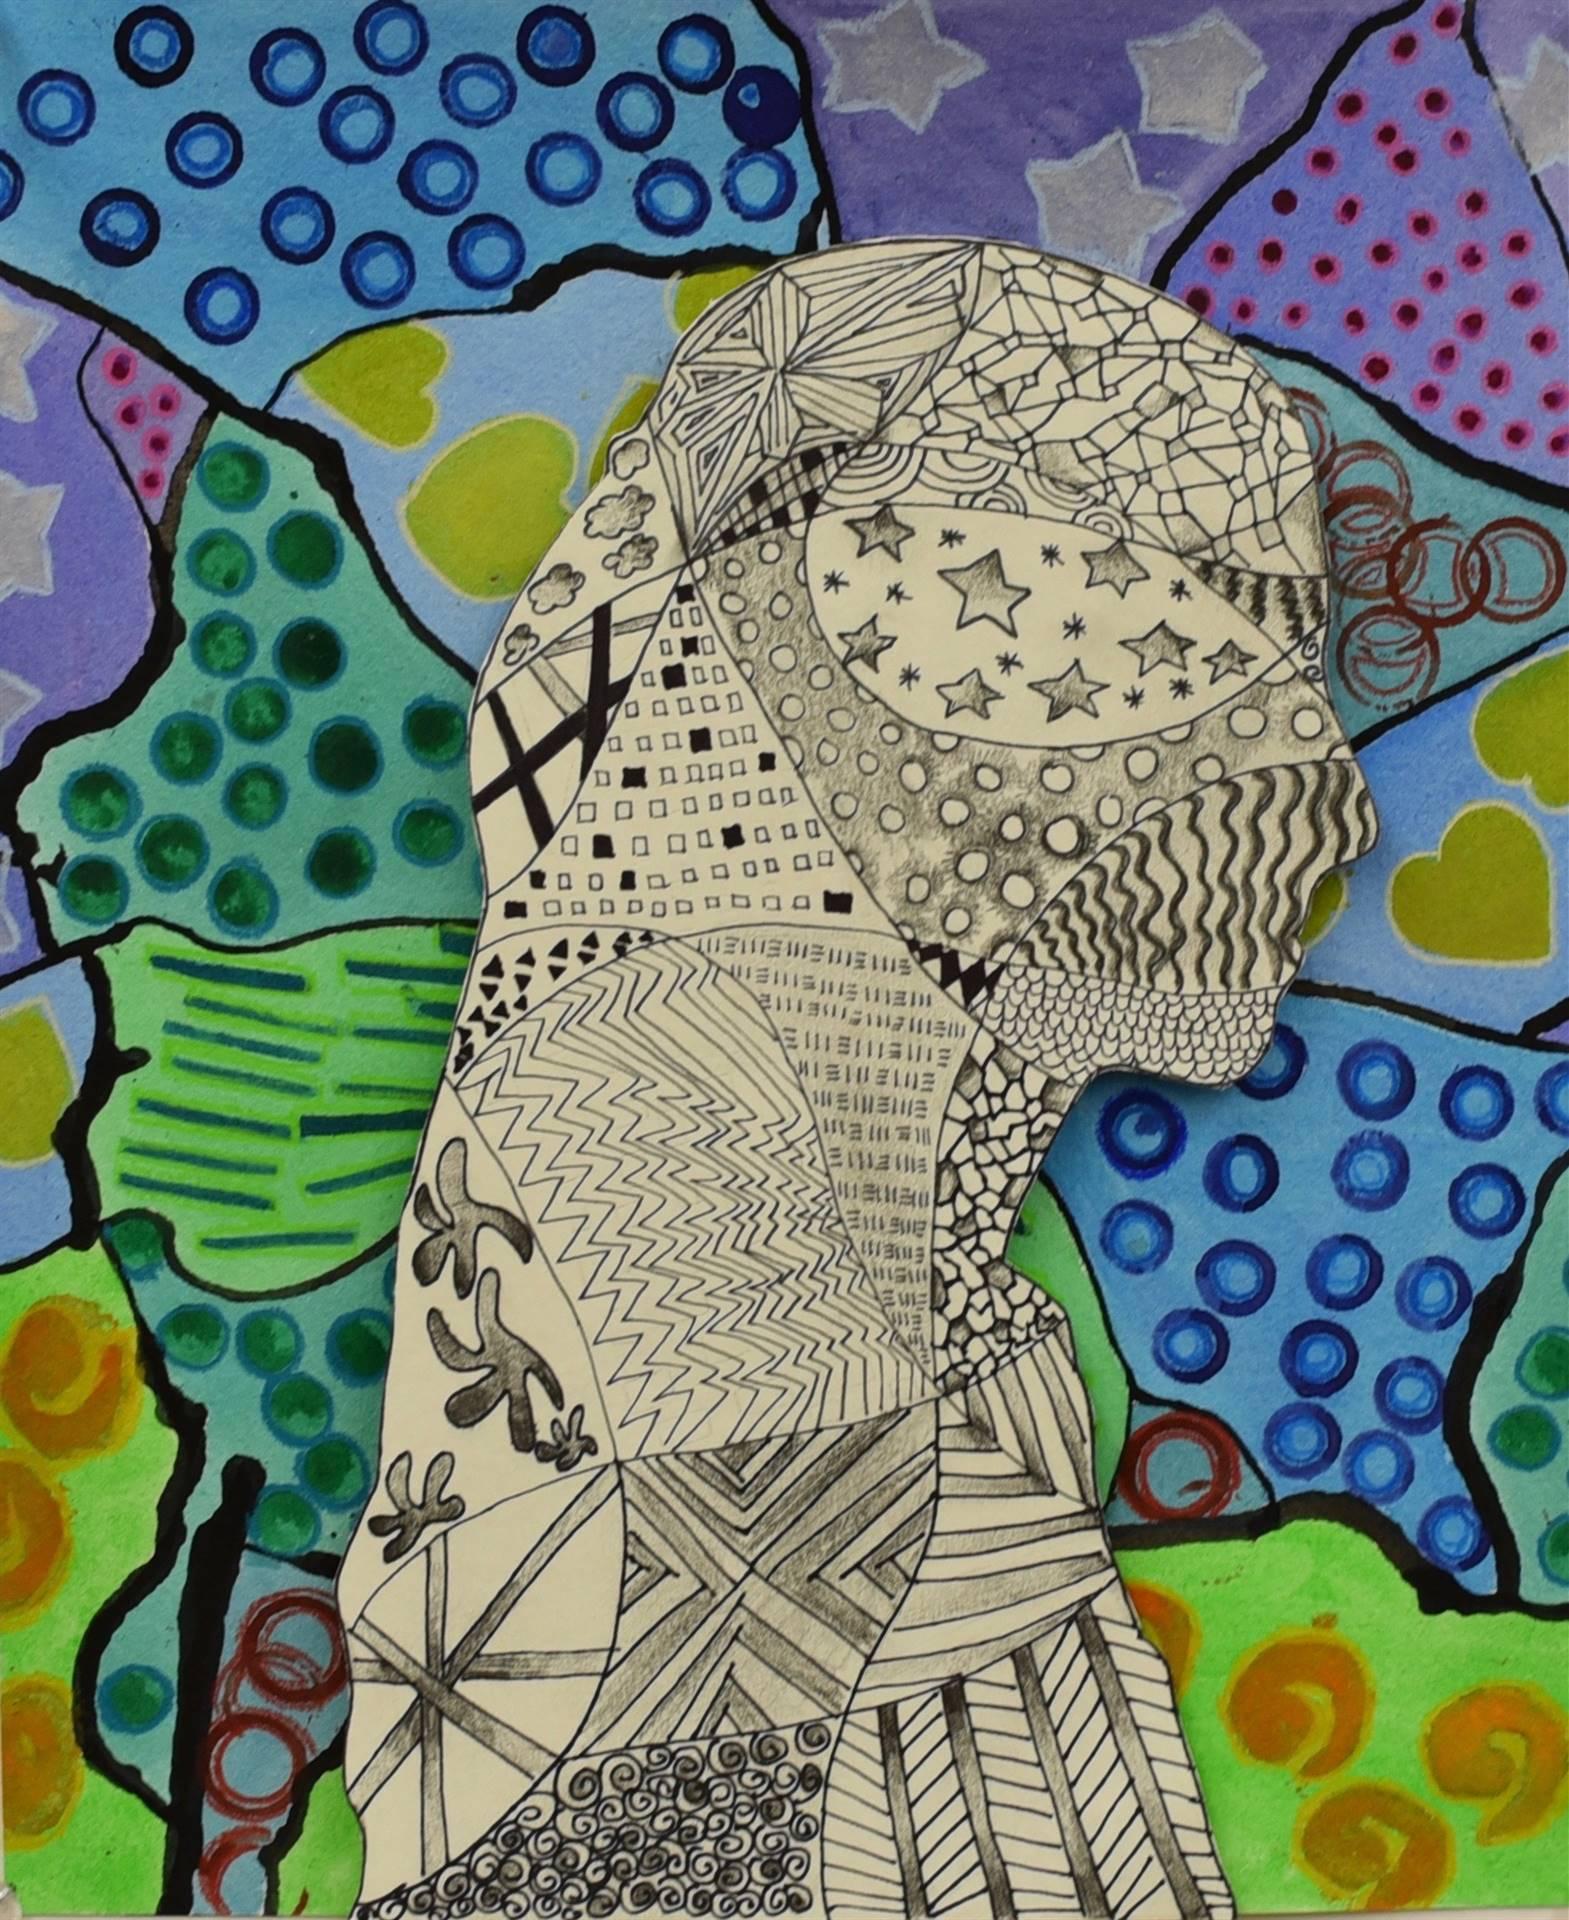 Brecksville-Broadview Hts. Middle School Art Projects 31